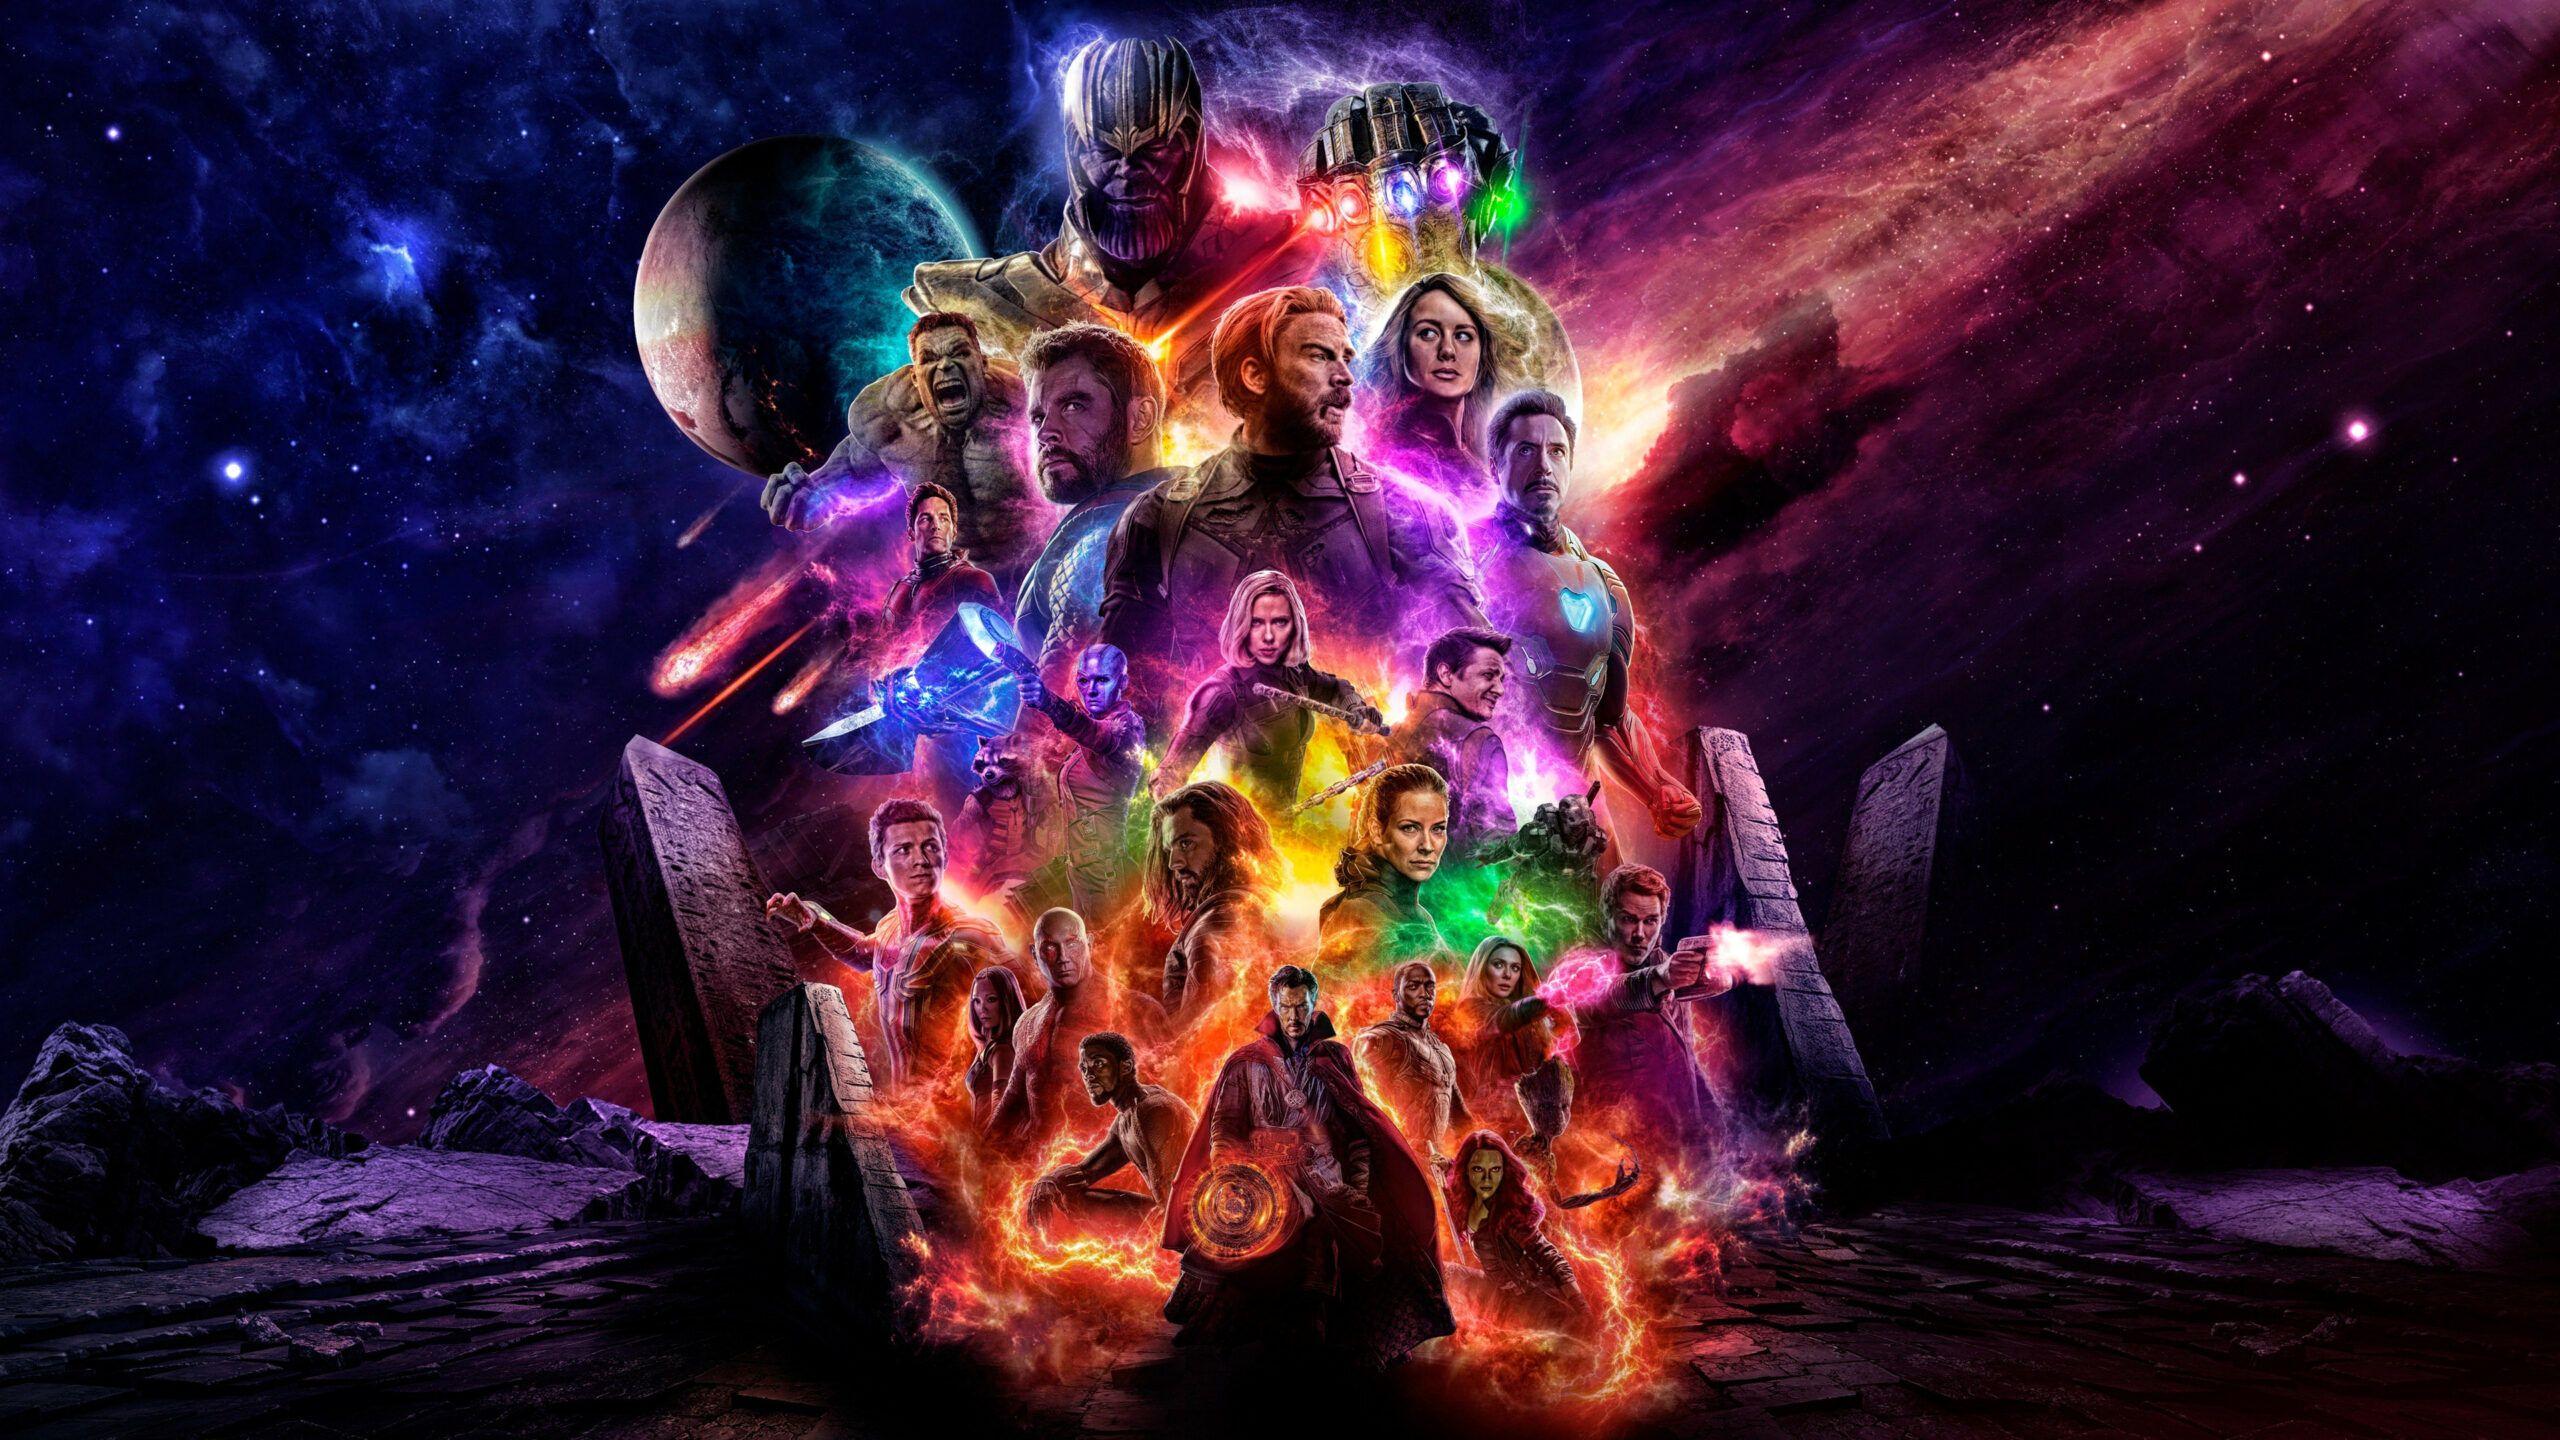 New 4k Avengers Endgame Desktop Hd Wallpapers Avengers Endgame Marvel Movies Avengers All Marvel Movies